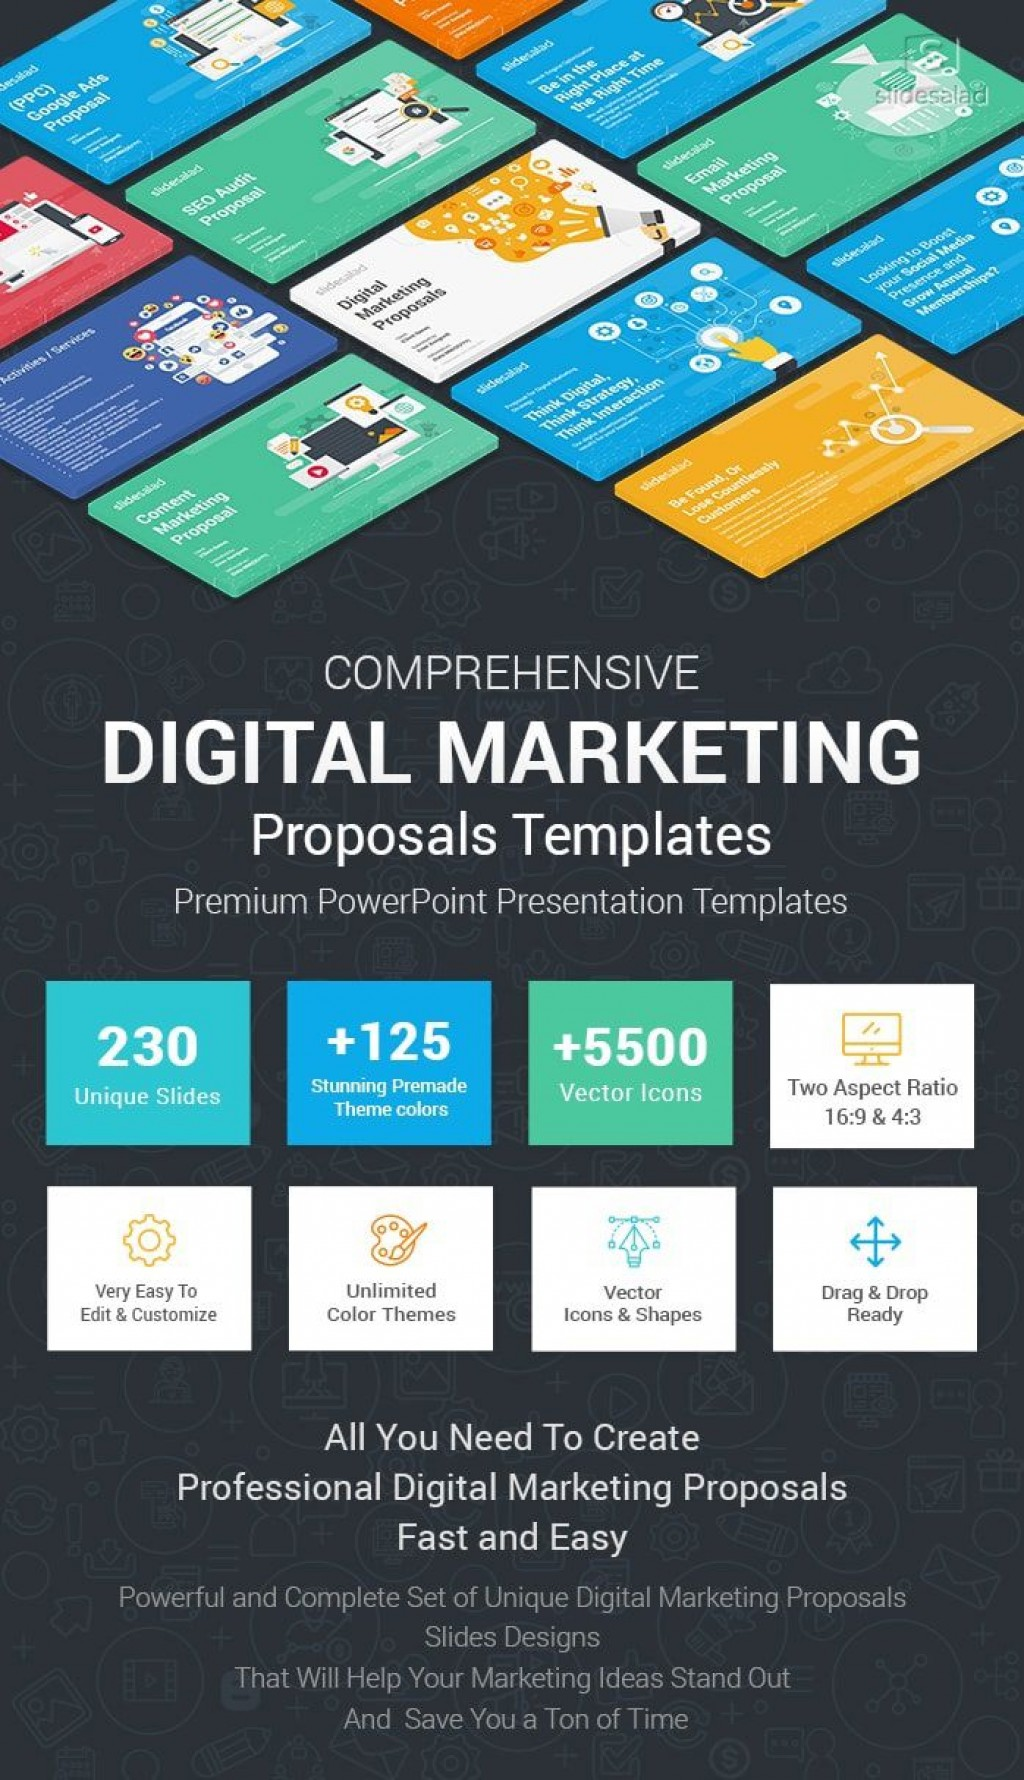 003 Breathtaking Social Media Proposal Template Ppt Inspiration Large